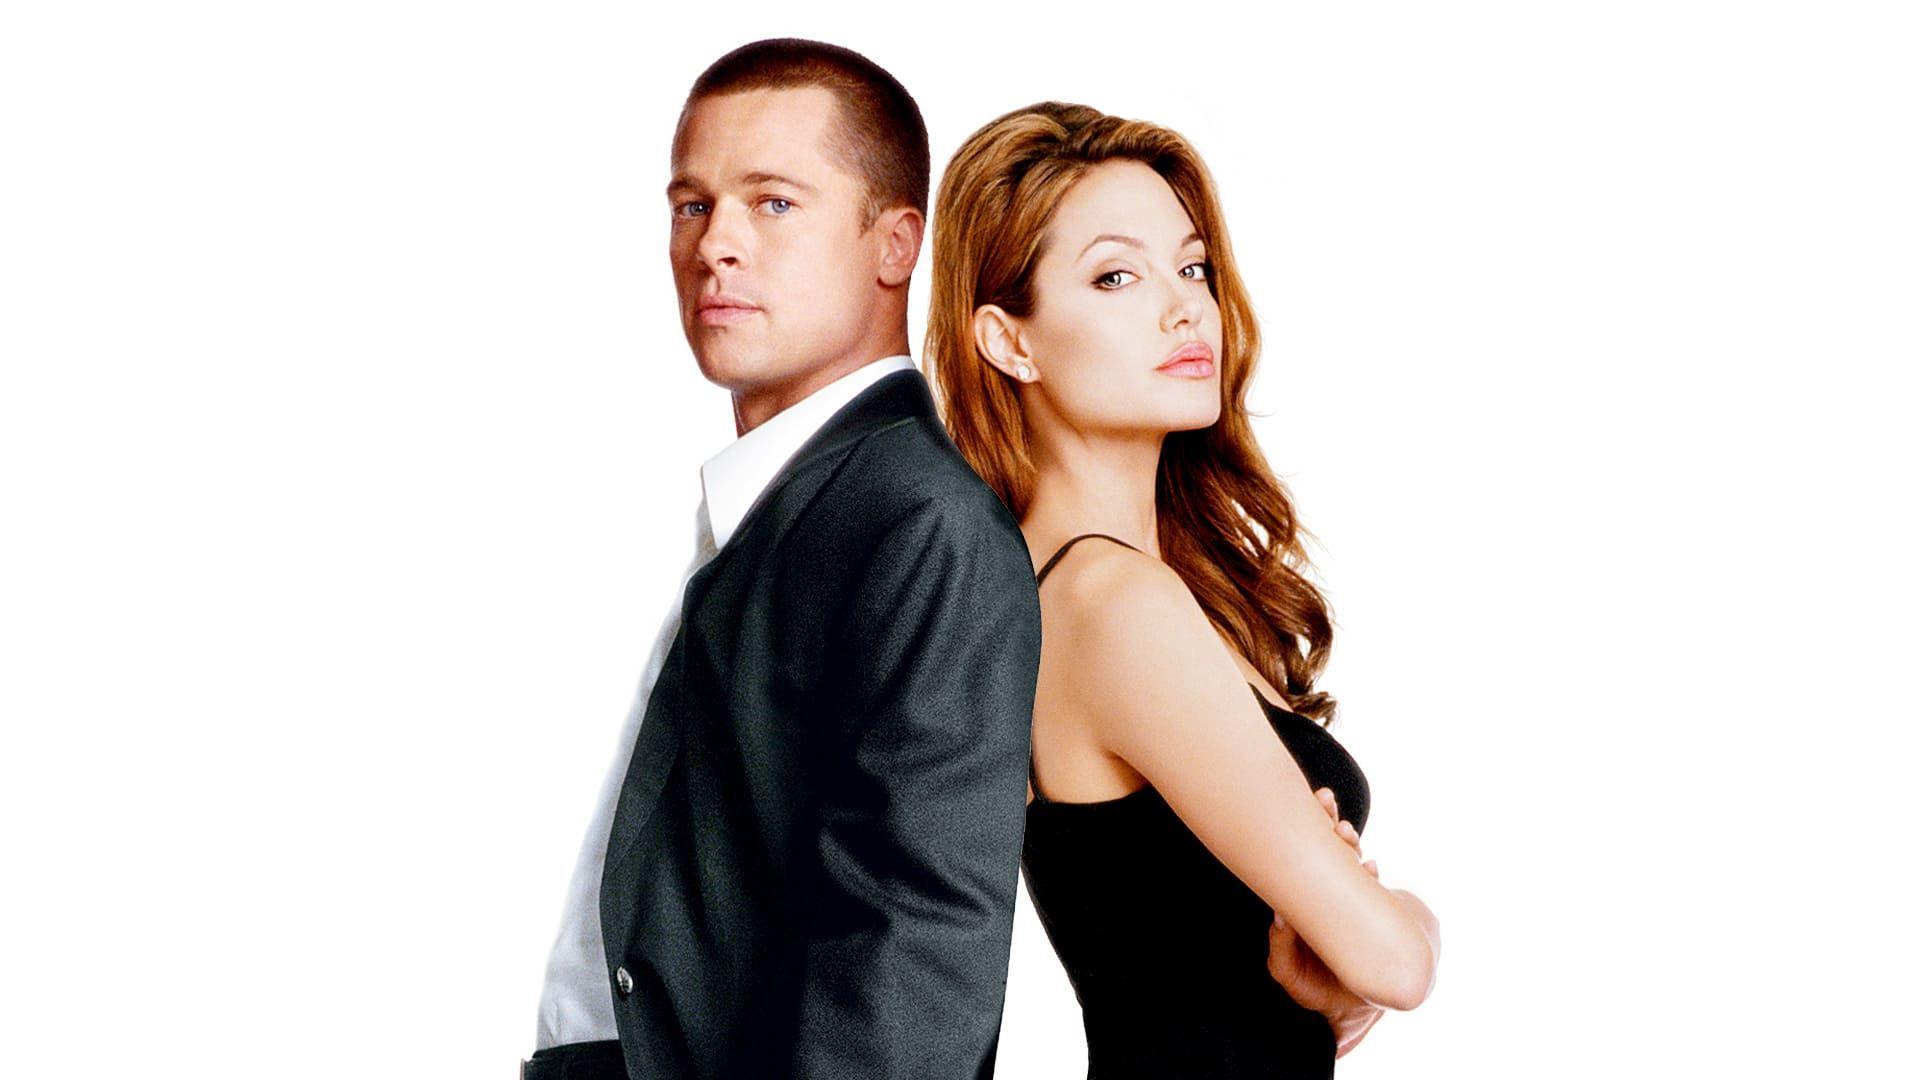 Hd Mozi Mr Es Mrs Smith 2005 Teljes Film Magyarul Online Hd Hu Mozi Mr Es Mrs Smith 2005 Teljes Film Film D Action Brad Pitt Monsieur Et Madame Smith